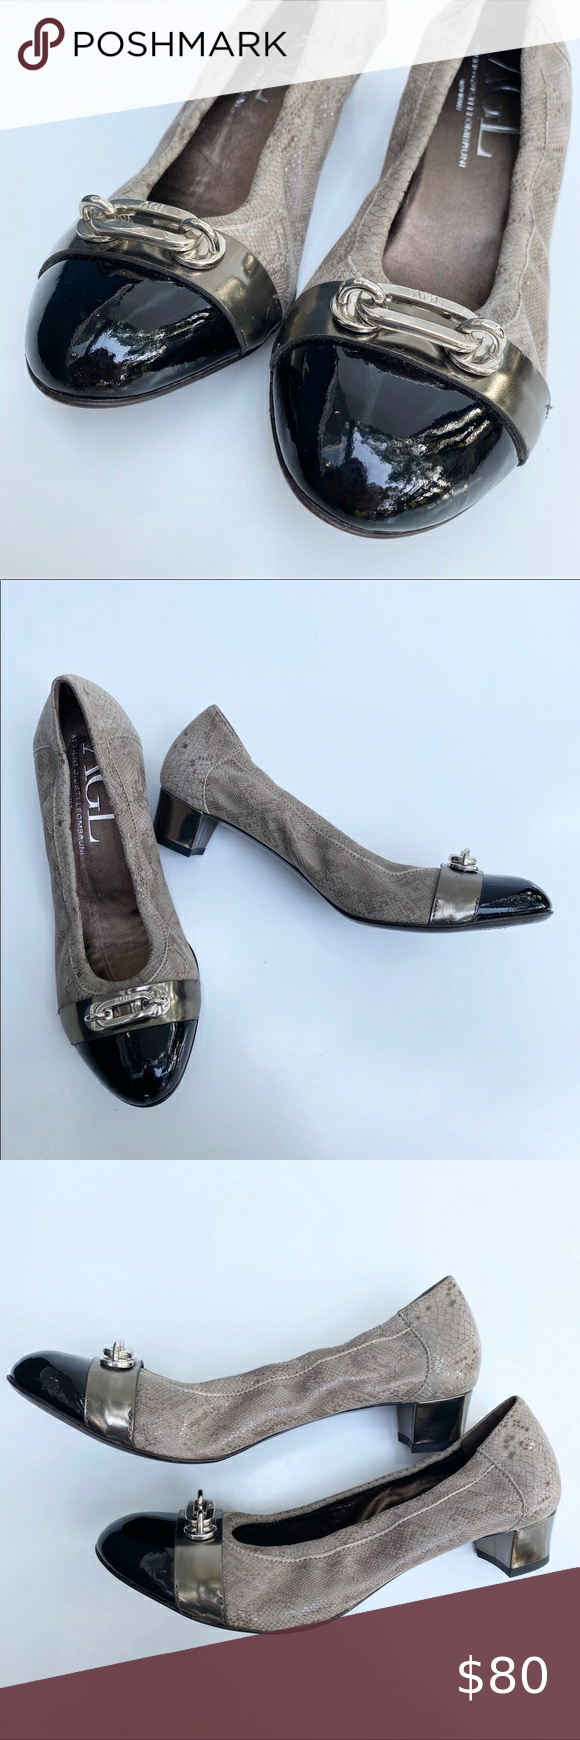 Attilio Giusti Leombruni shoes in 2020 | Shoes, Flat shoes